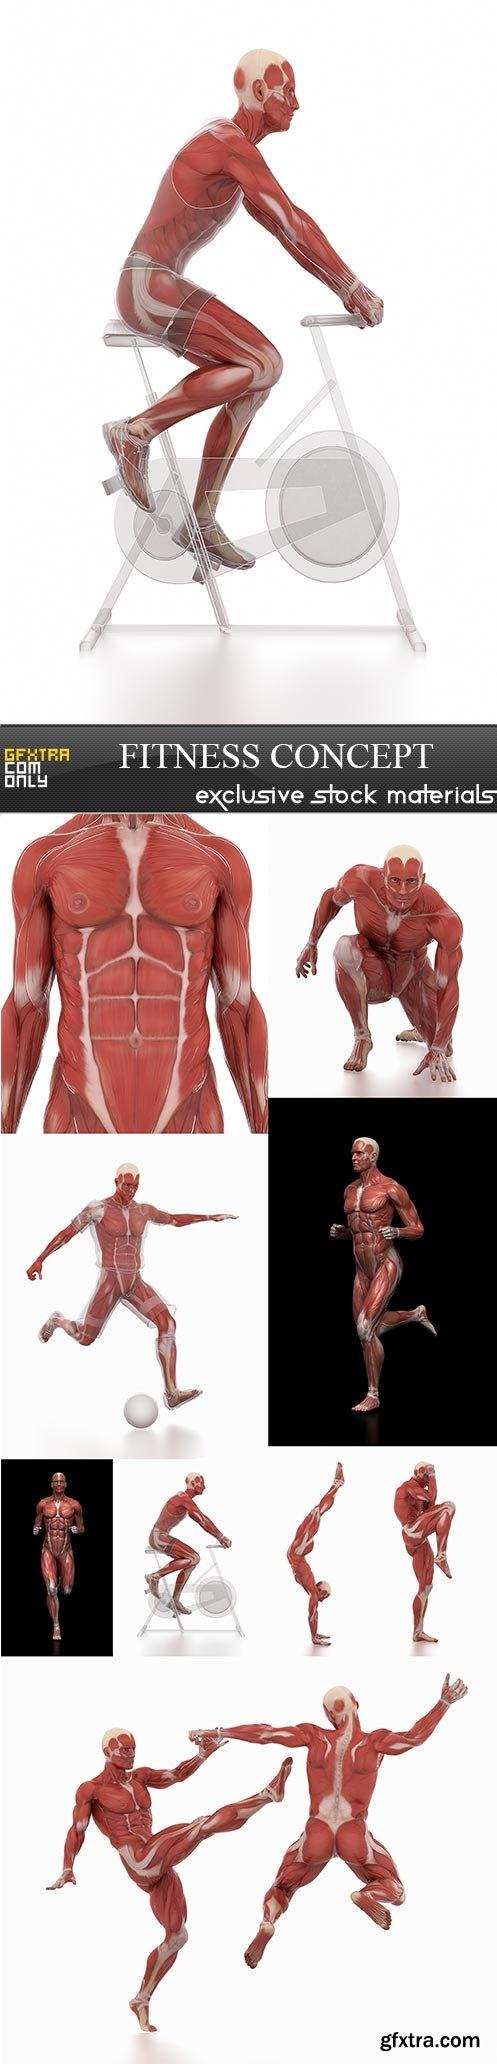 Fitness concept, 9 x UHQ JPEG